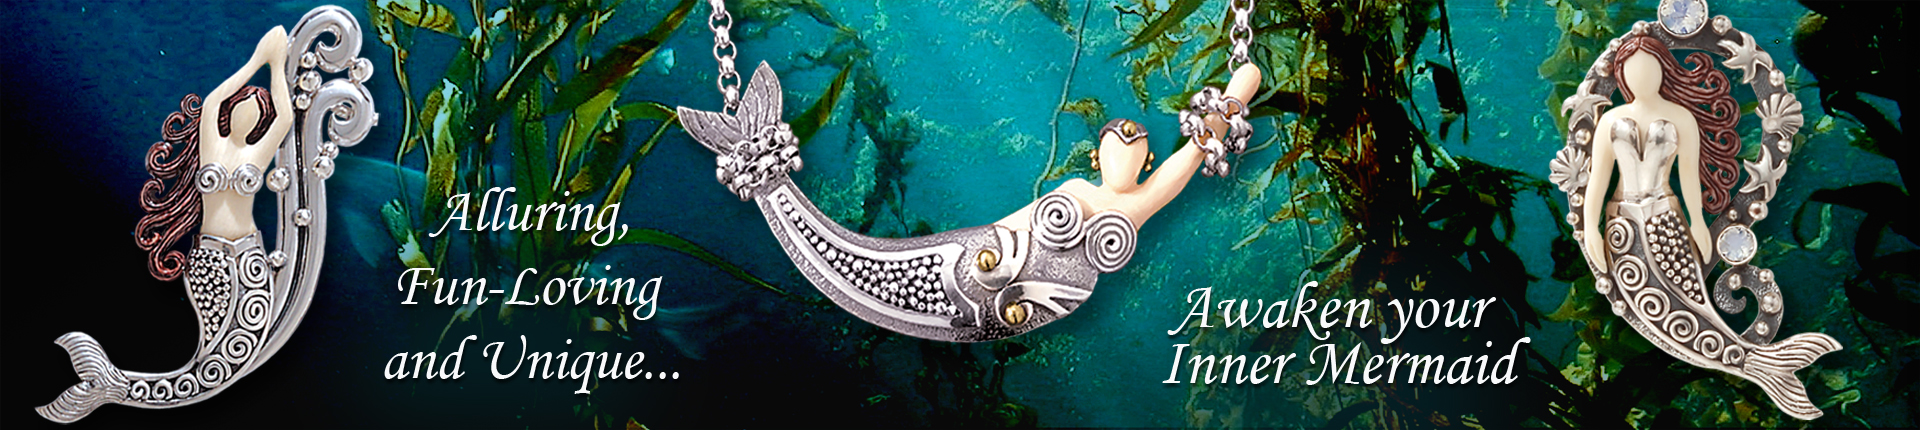 Zealandia sterling silver mermaid jewelry